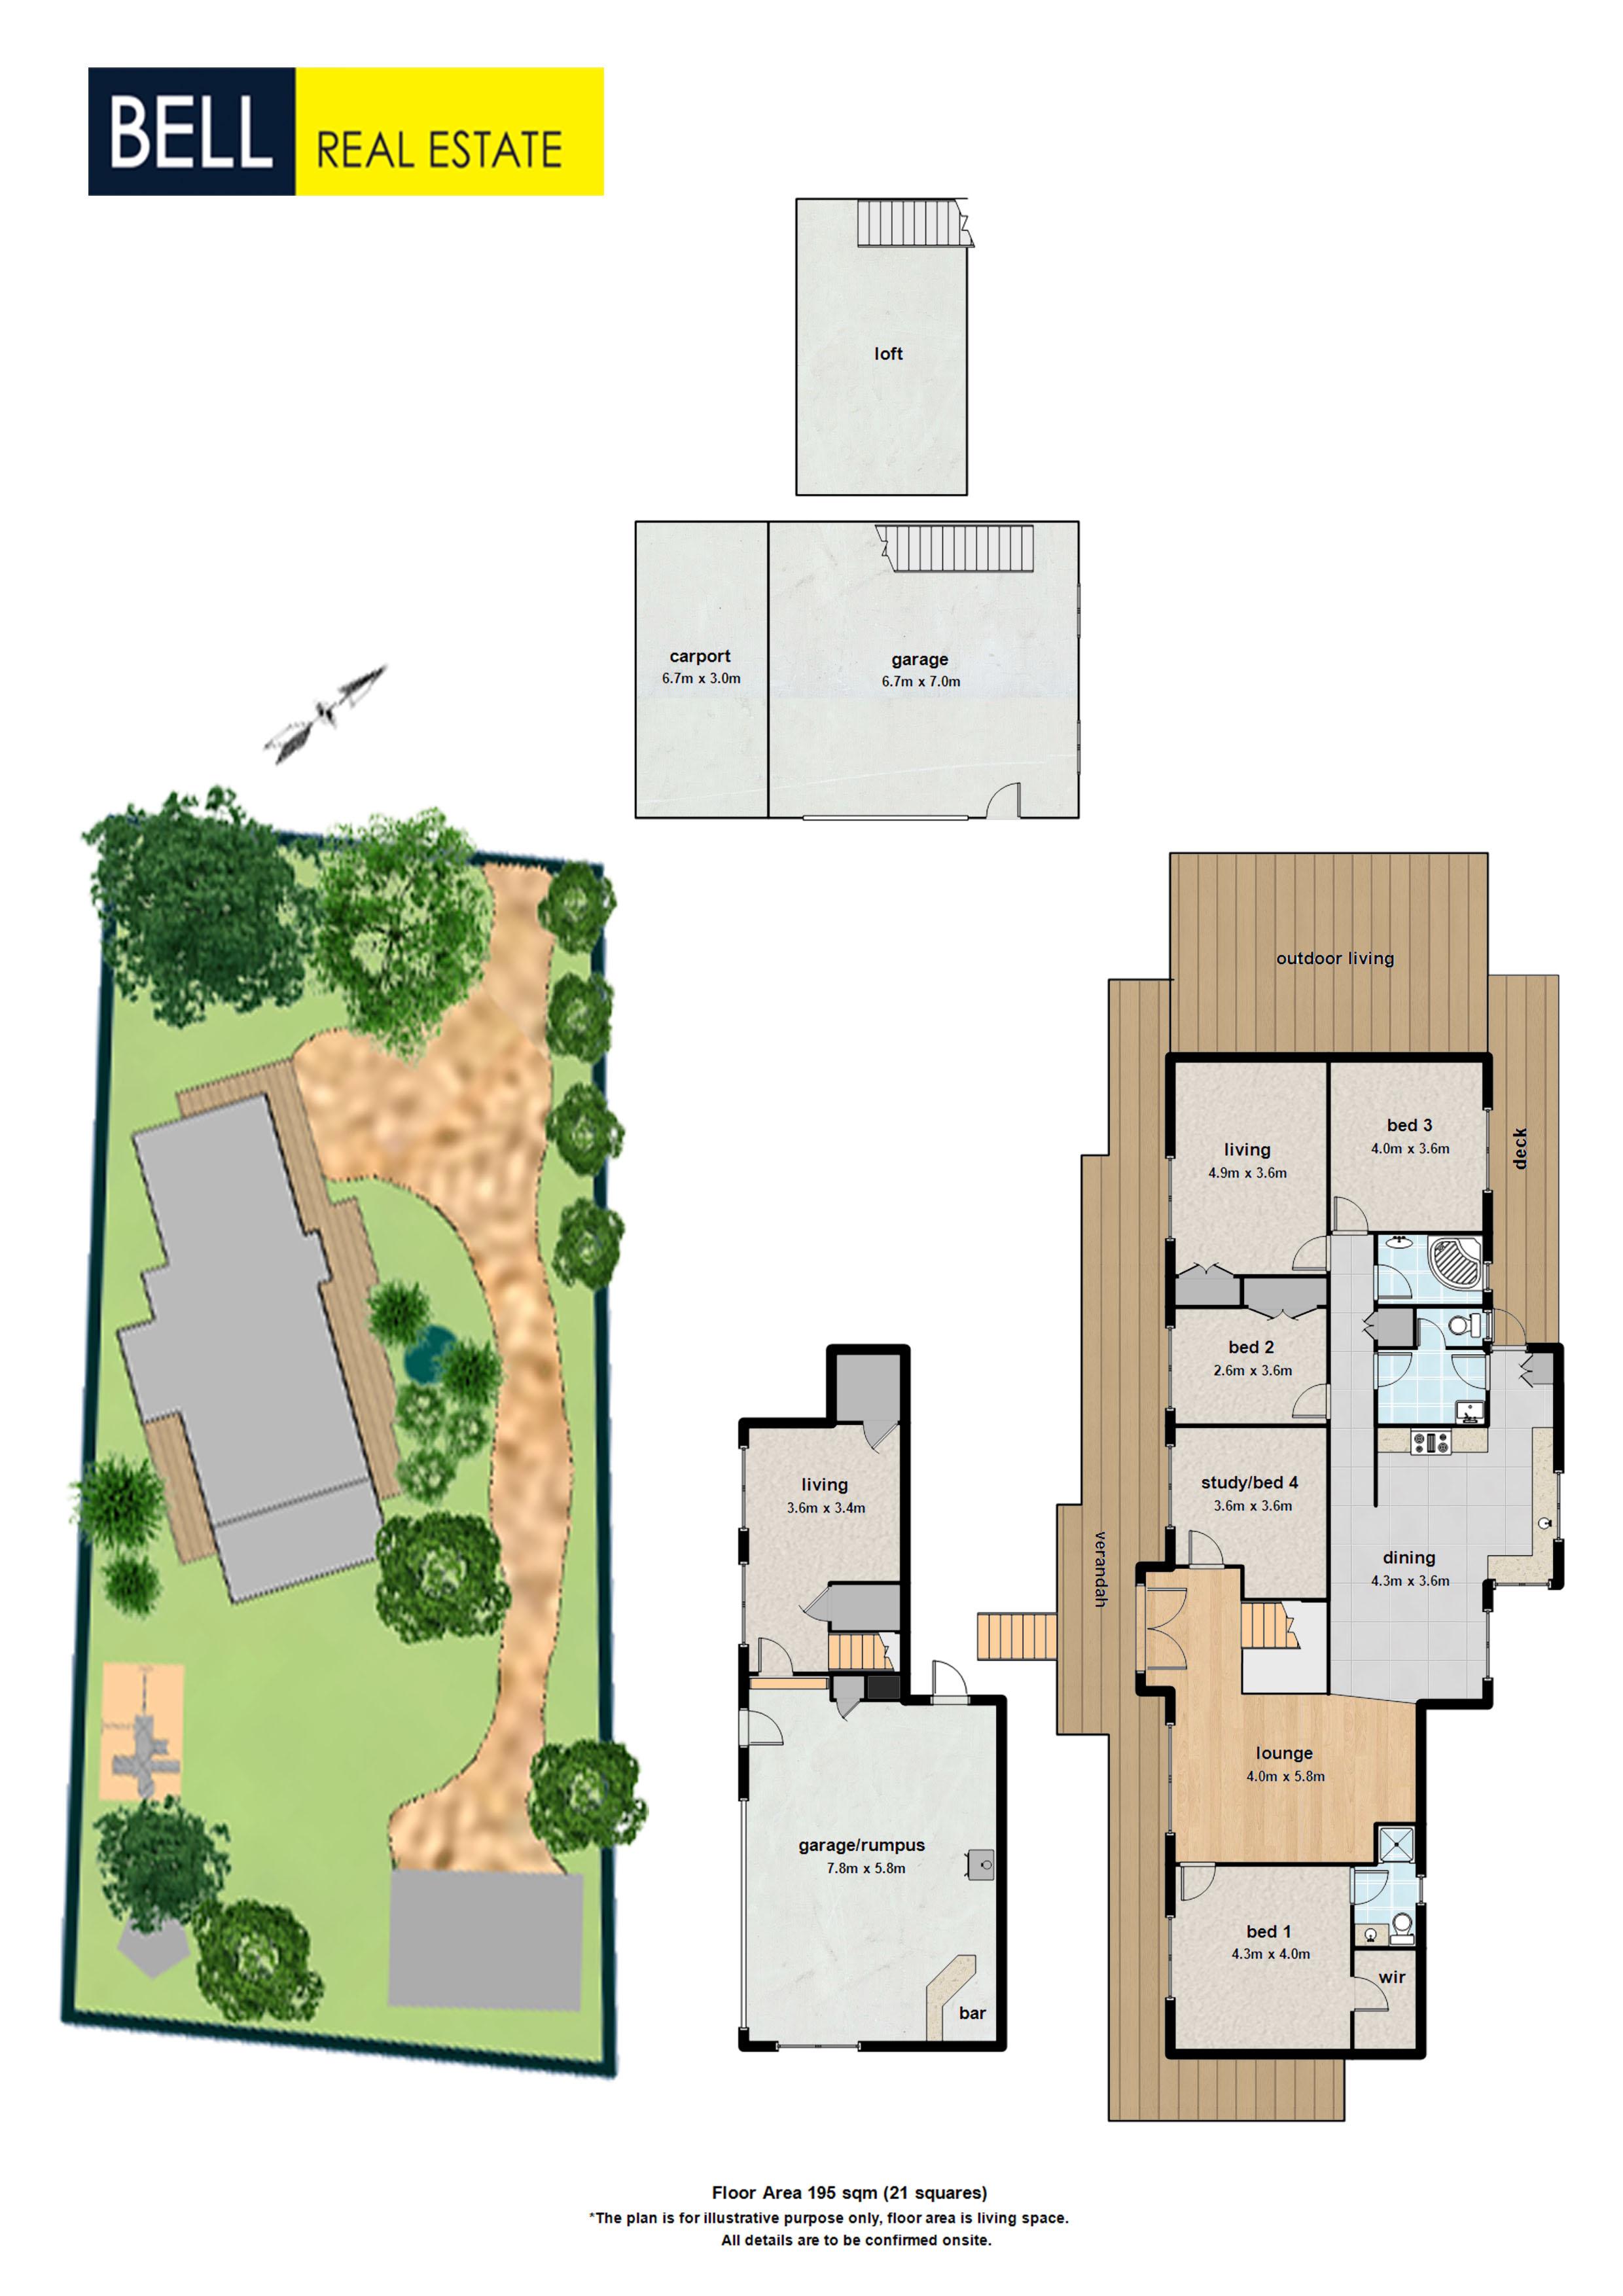 https://assets.boxdice.com.au/bell_re/listings/16913/4cf5d0f9.jpg